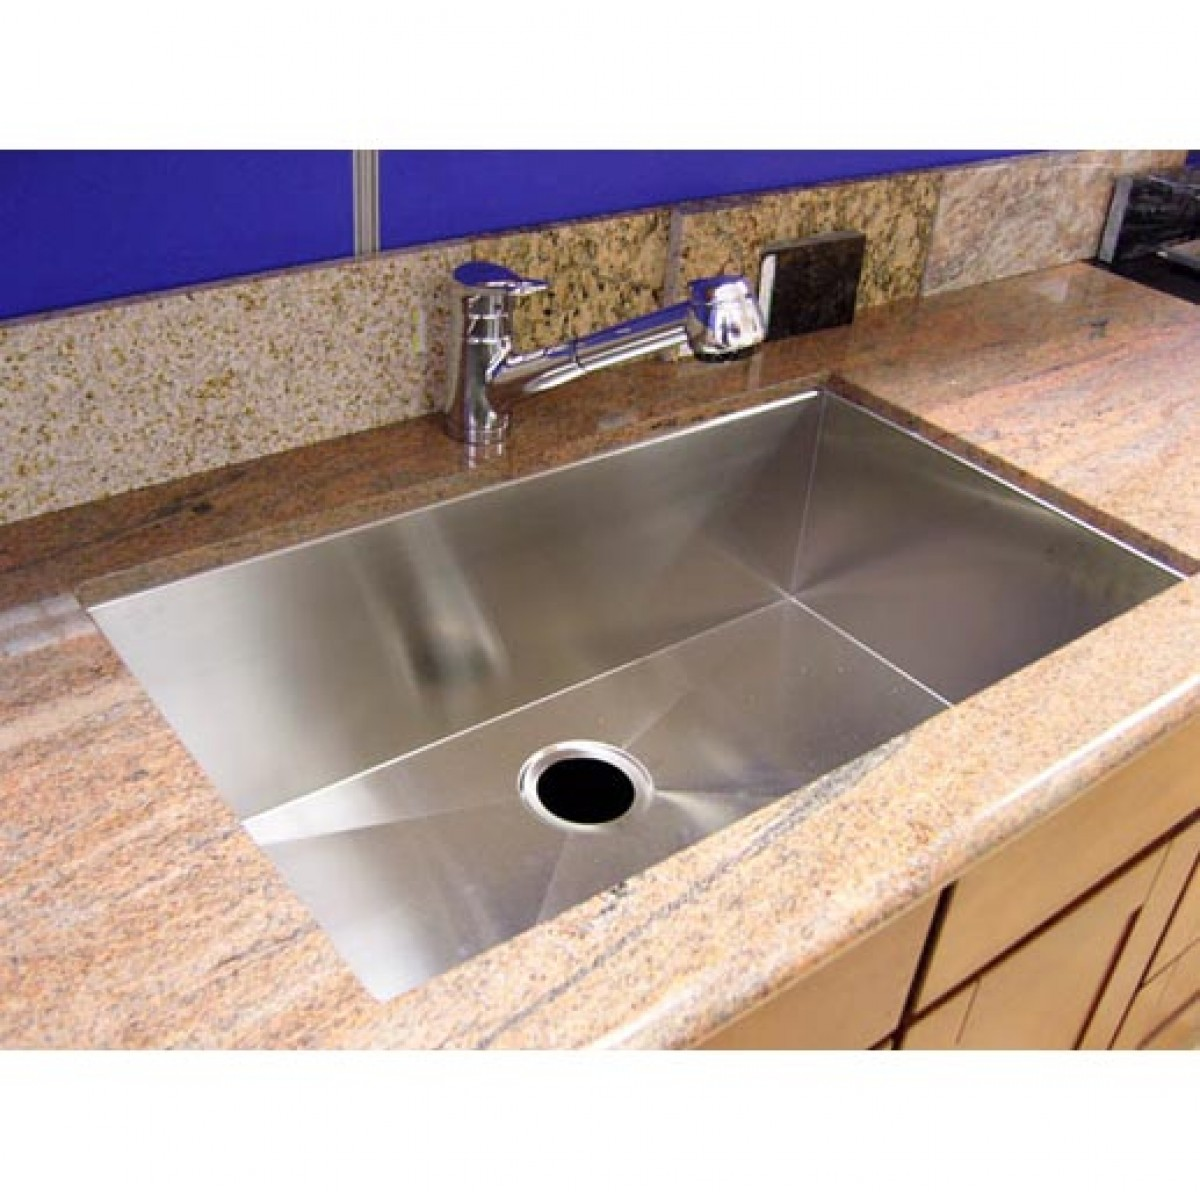 36 Inch Stainless Steel Undermount Single Bowl Kitchen